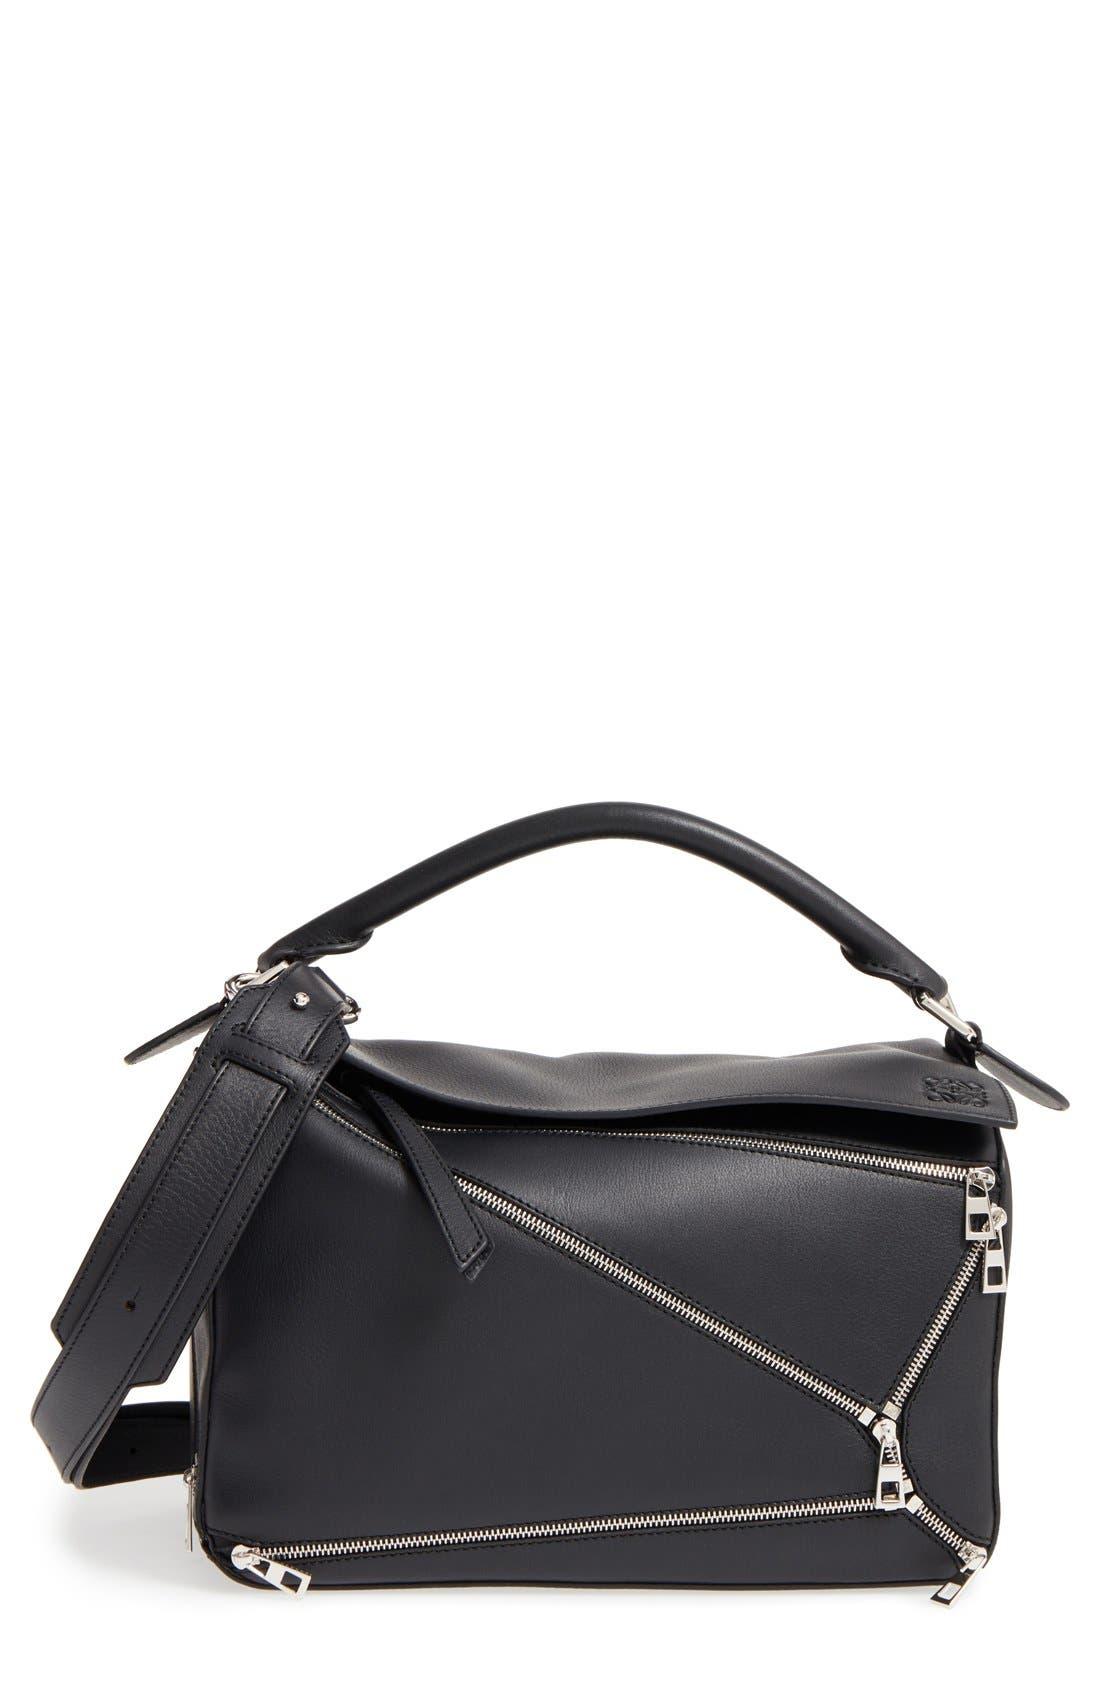 LOEWE 'Puzzle Zips' Calfskin Leather Bag